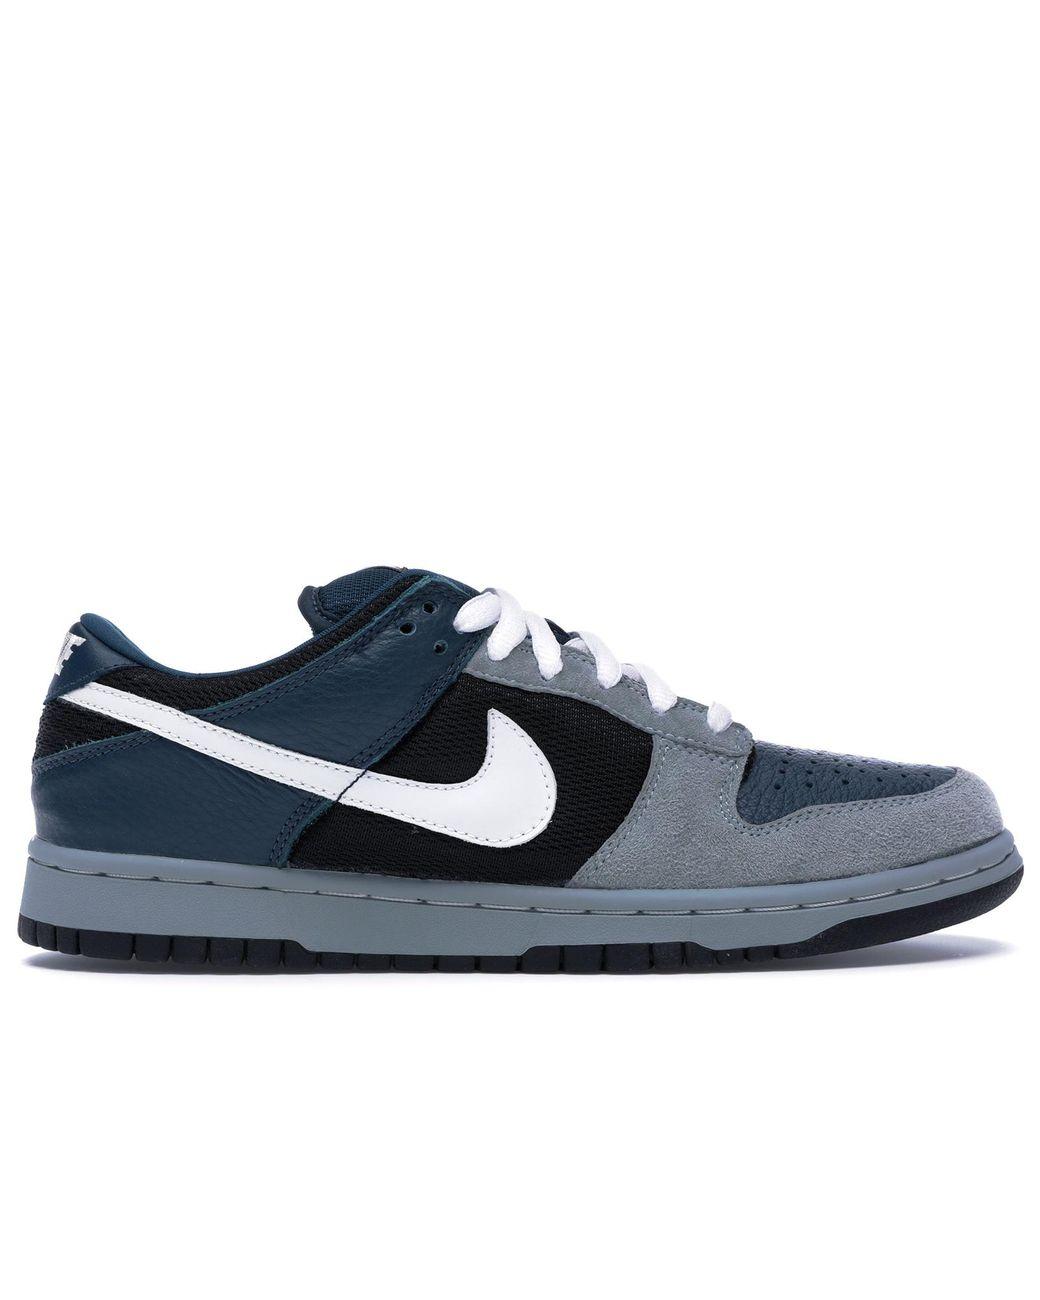 Nike Dunk Low Pro Sb Futura for Men - Lyst